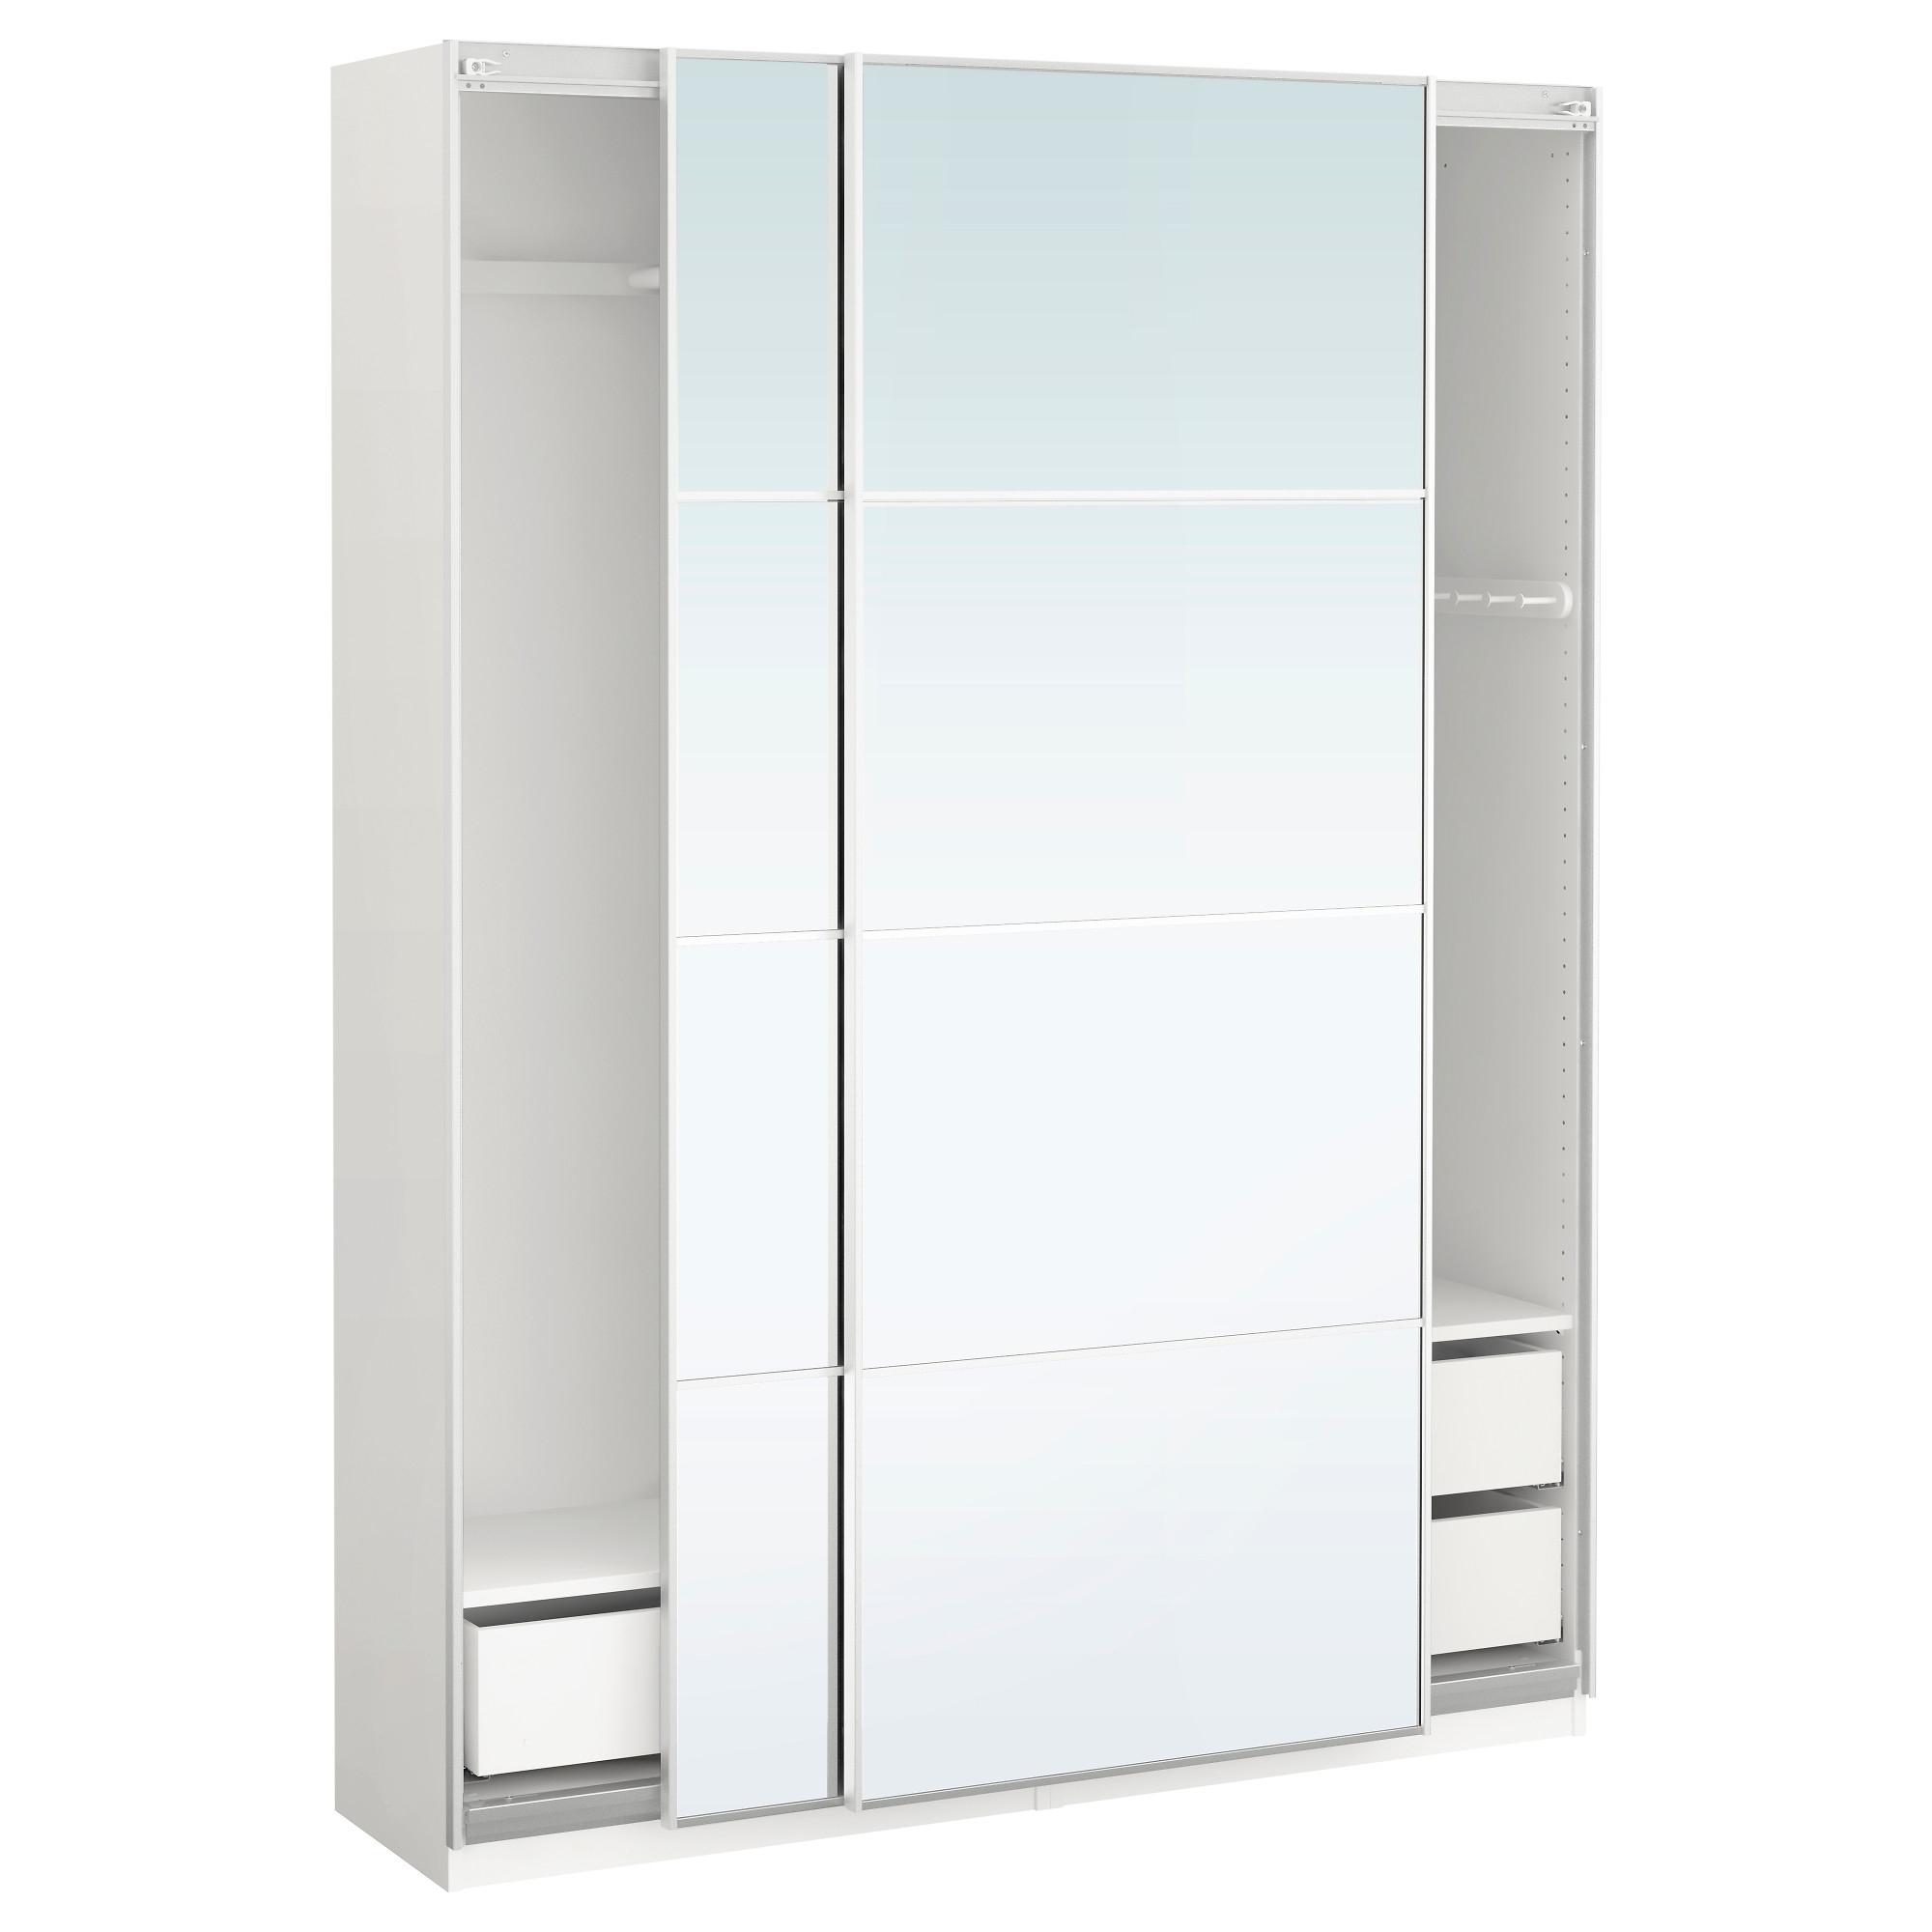 Preferred Pax Wardrobe White/auli Mirror Glass 150X44X201 Cm – Ikea Within Fitted Wardrobe Depth (View 12 of 15)